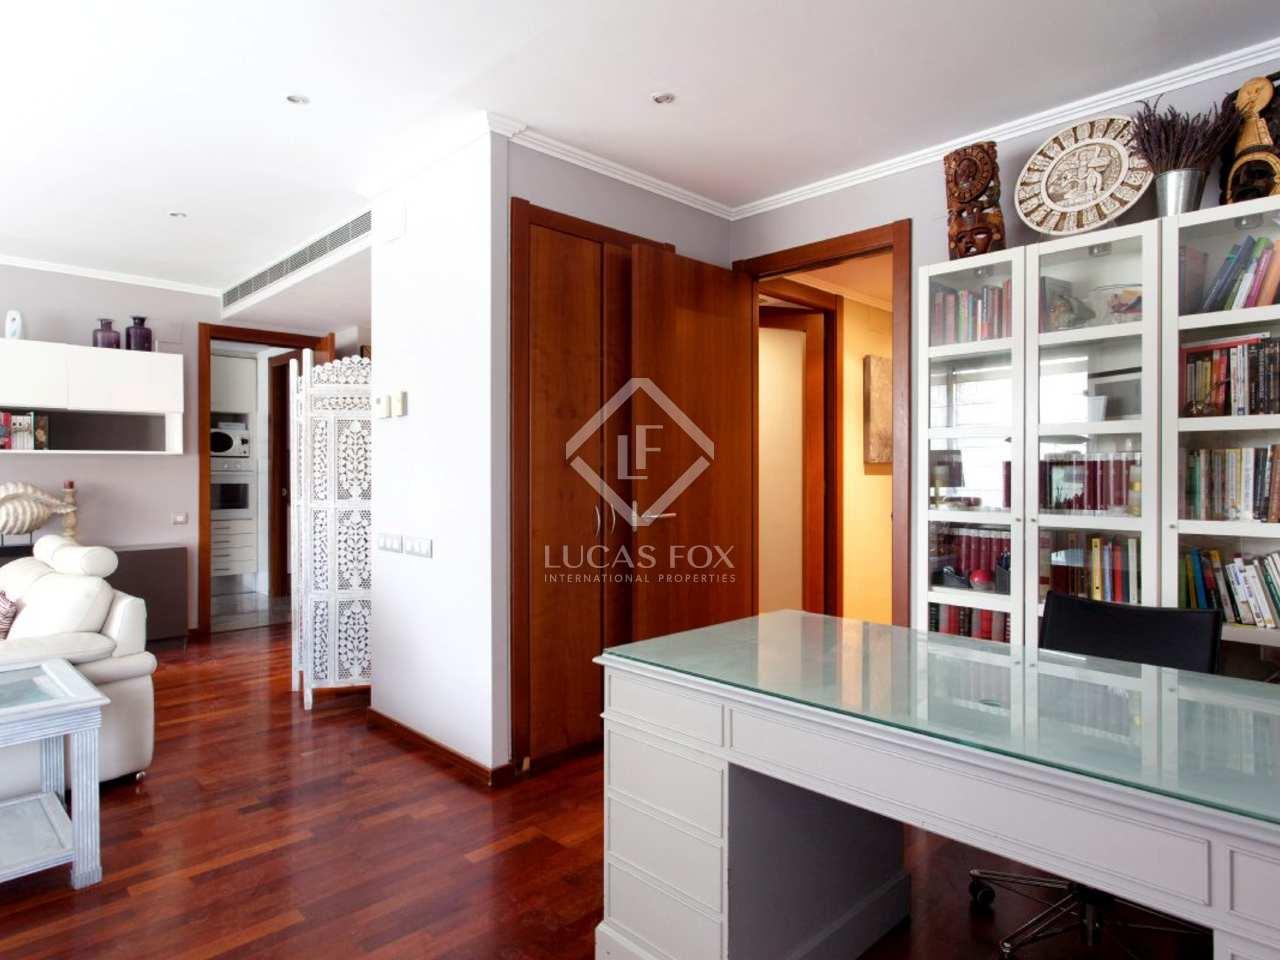 Apartment for sale in turo parc barcelona city zona alta - Zona alta barcelona ...